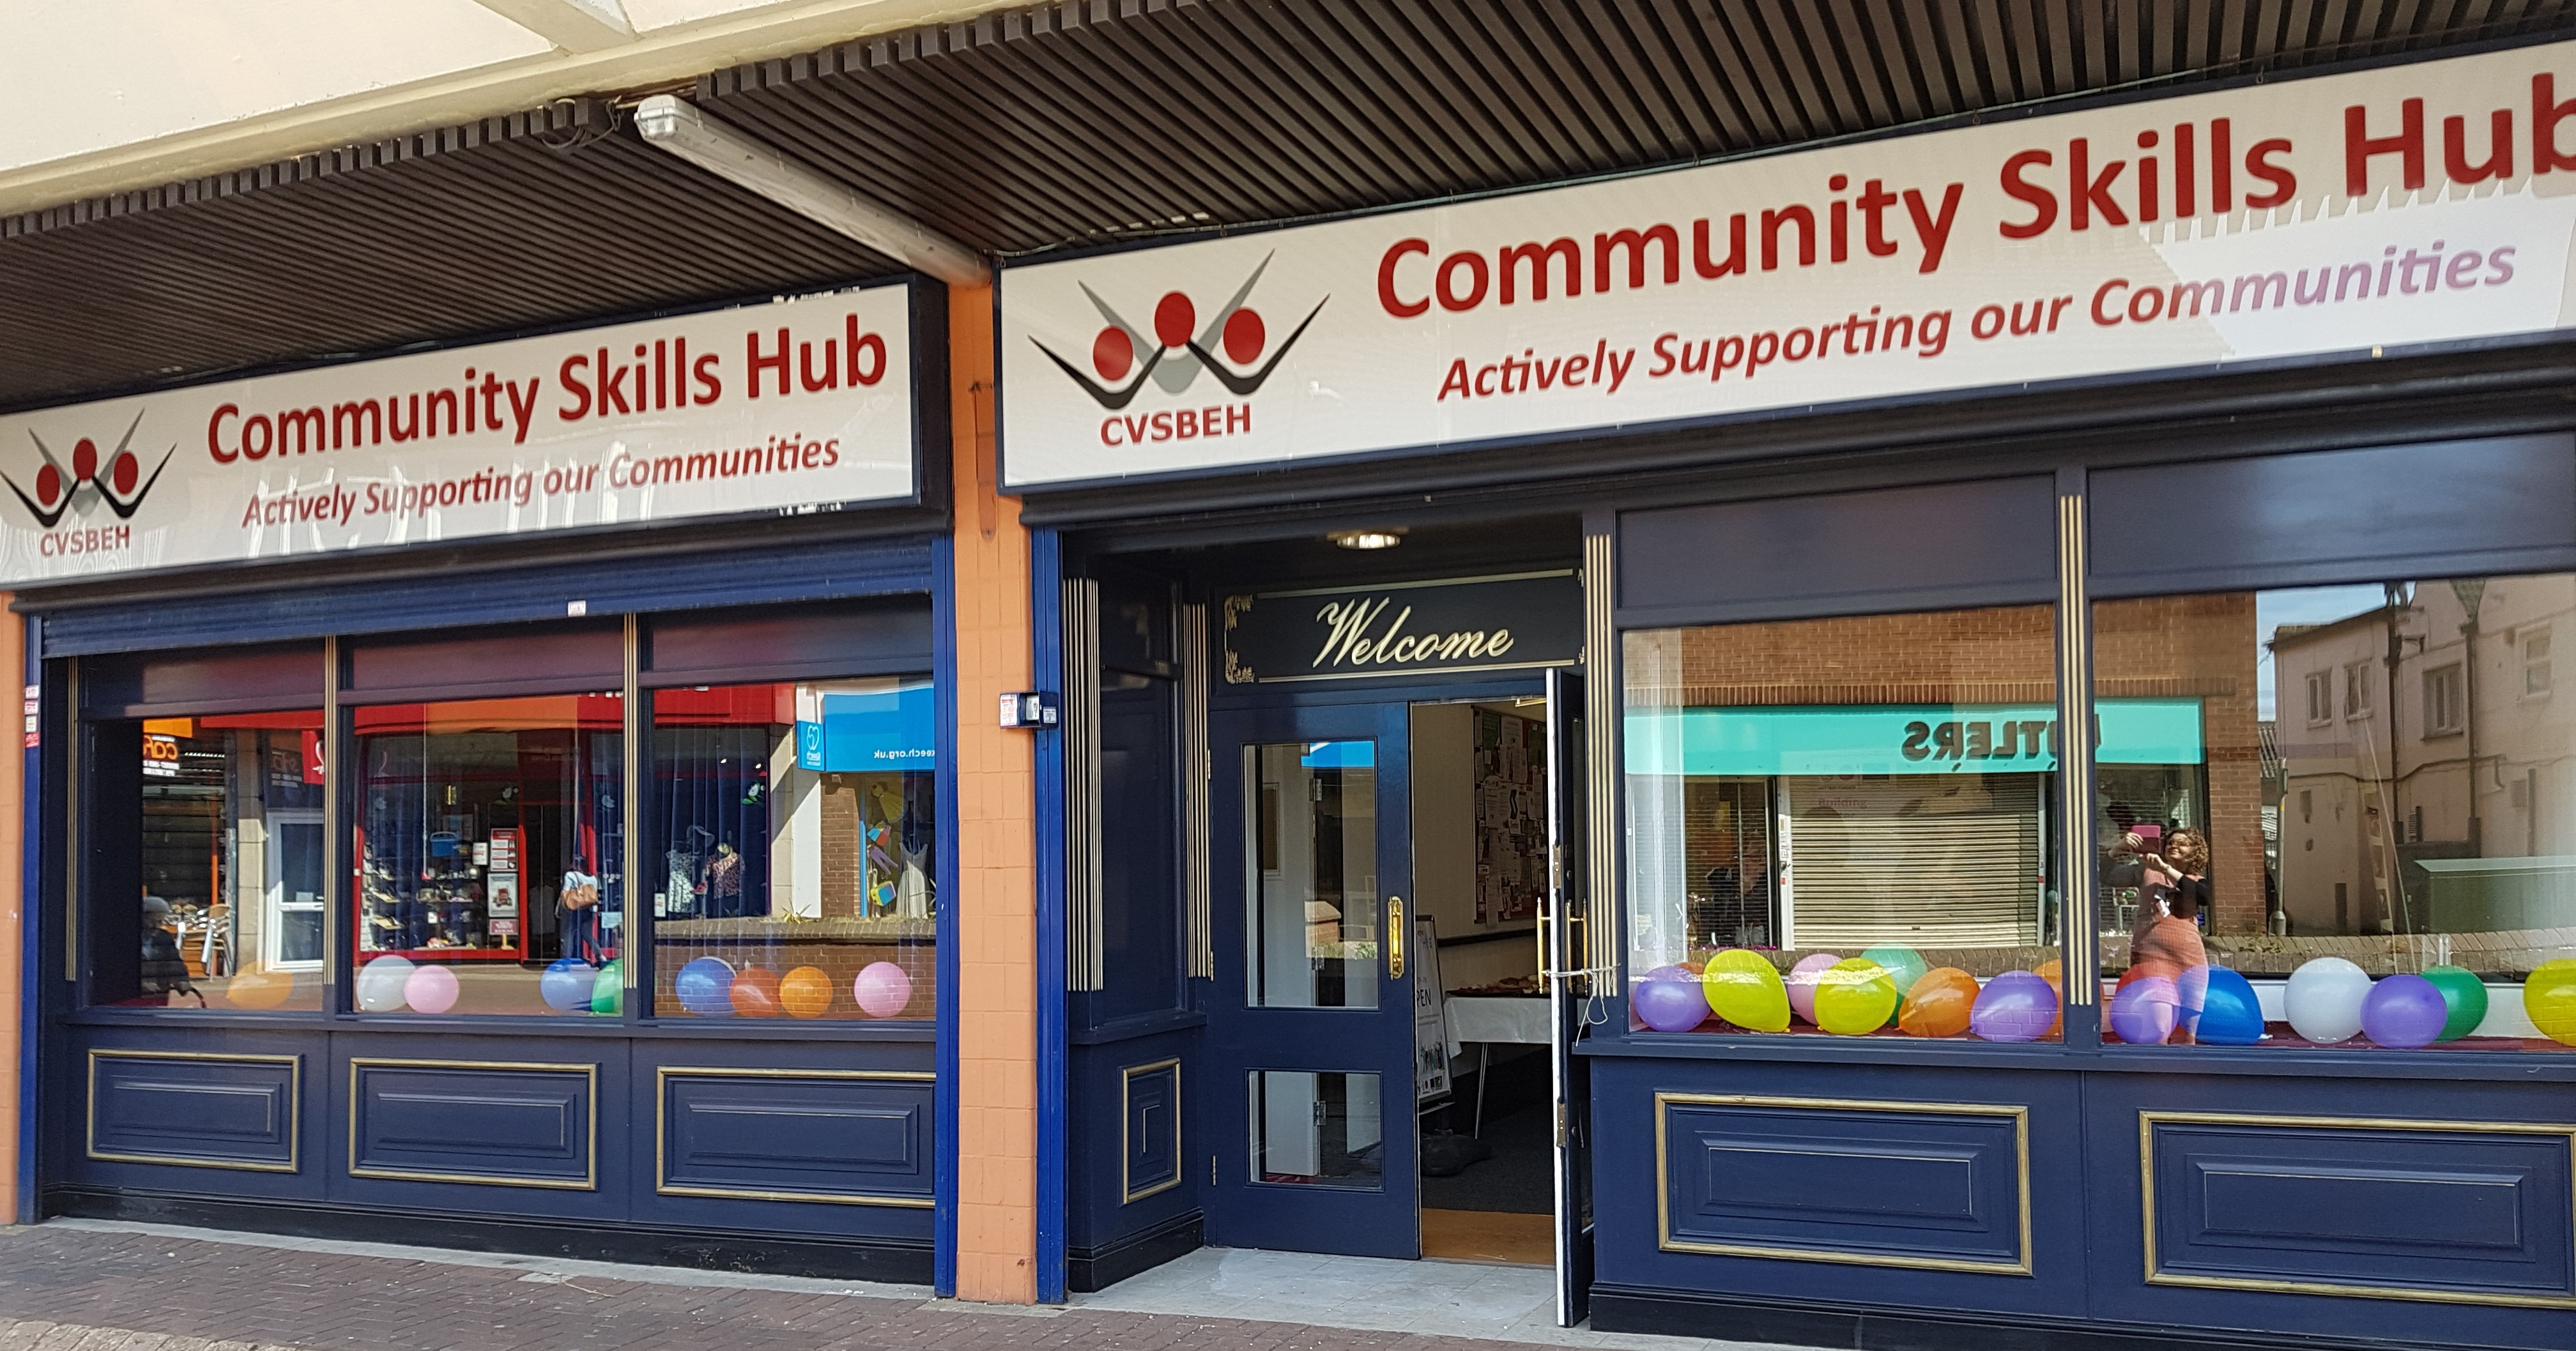 CVS BEH Community Skills Hub Opening